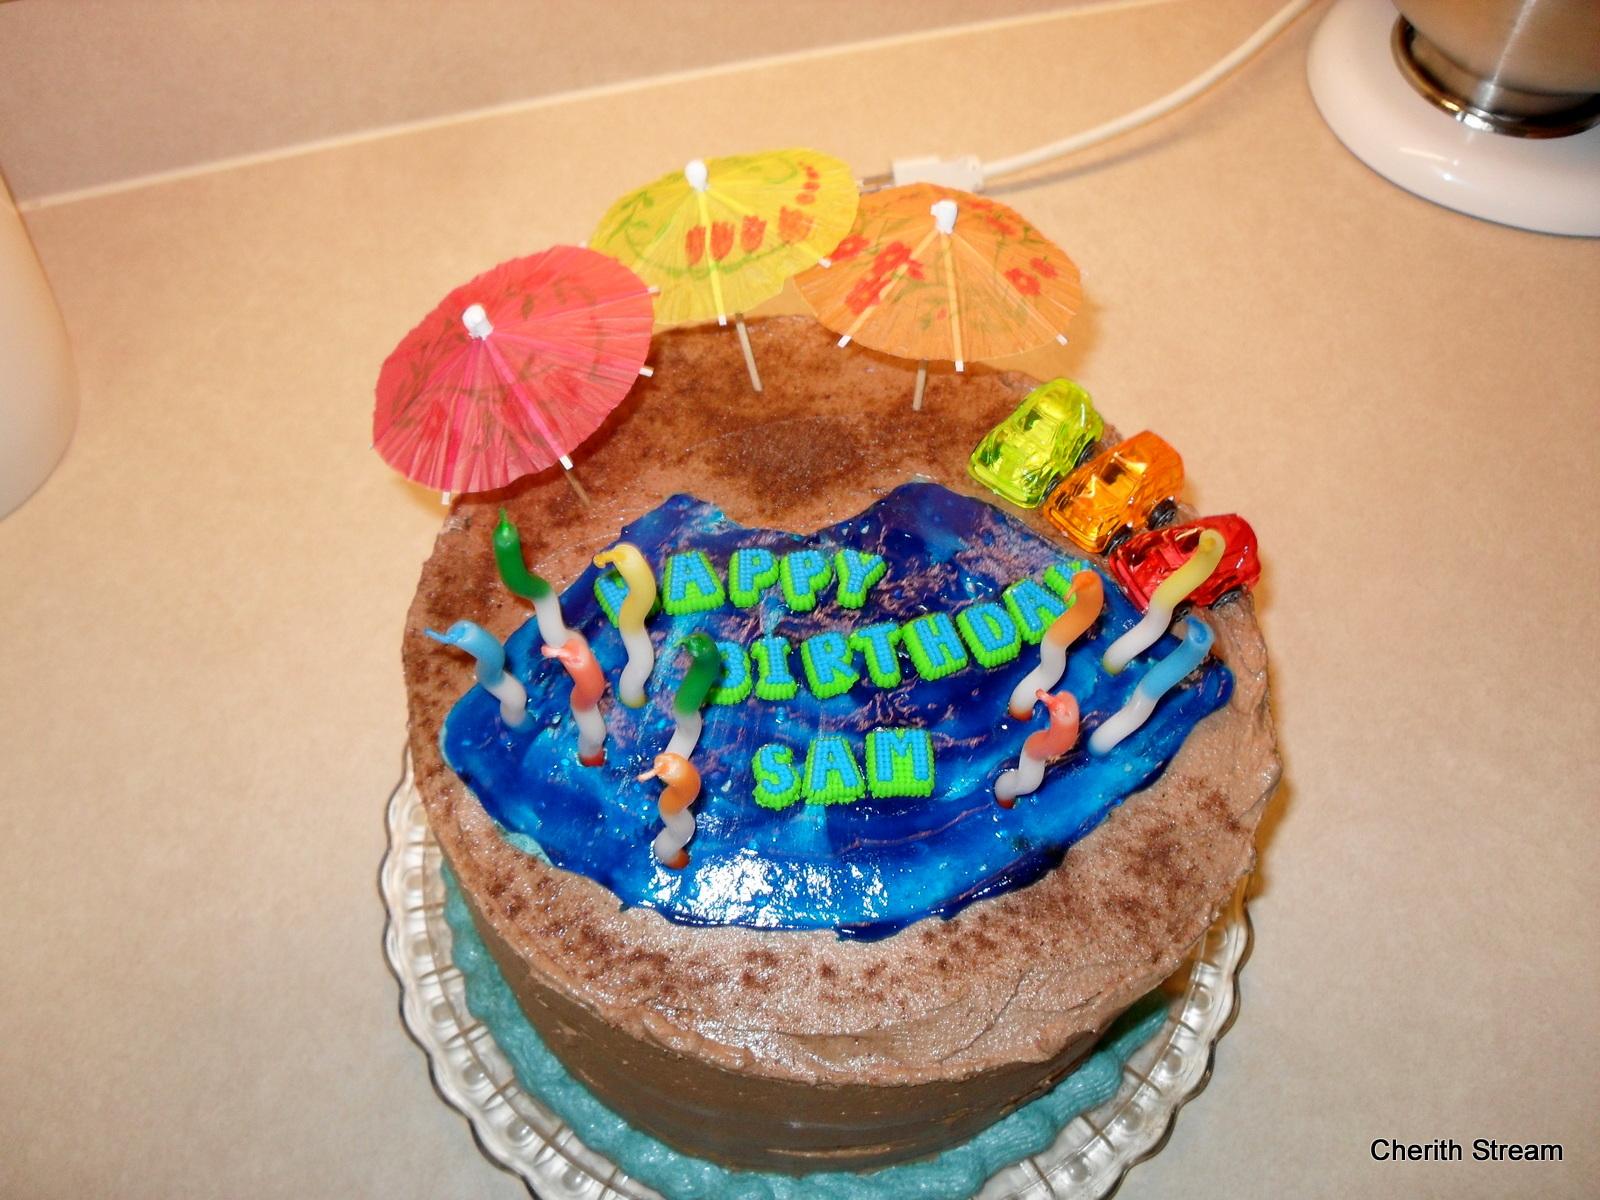 Sams 10th Birthday Cake Wills Blog Watching Heaven In Action